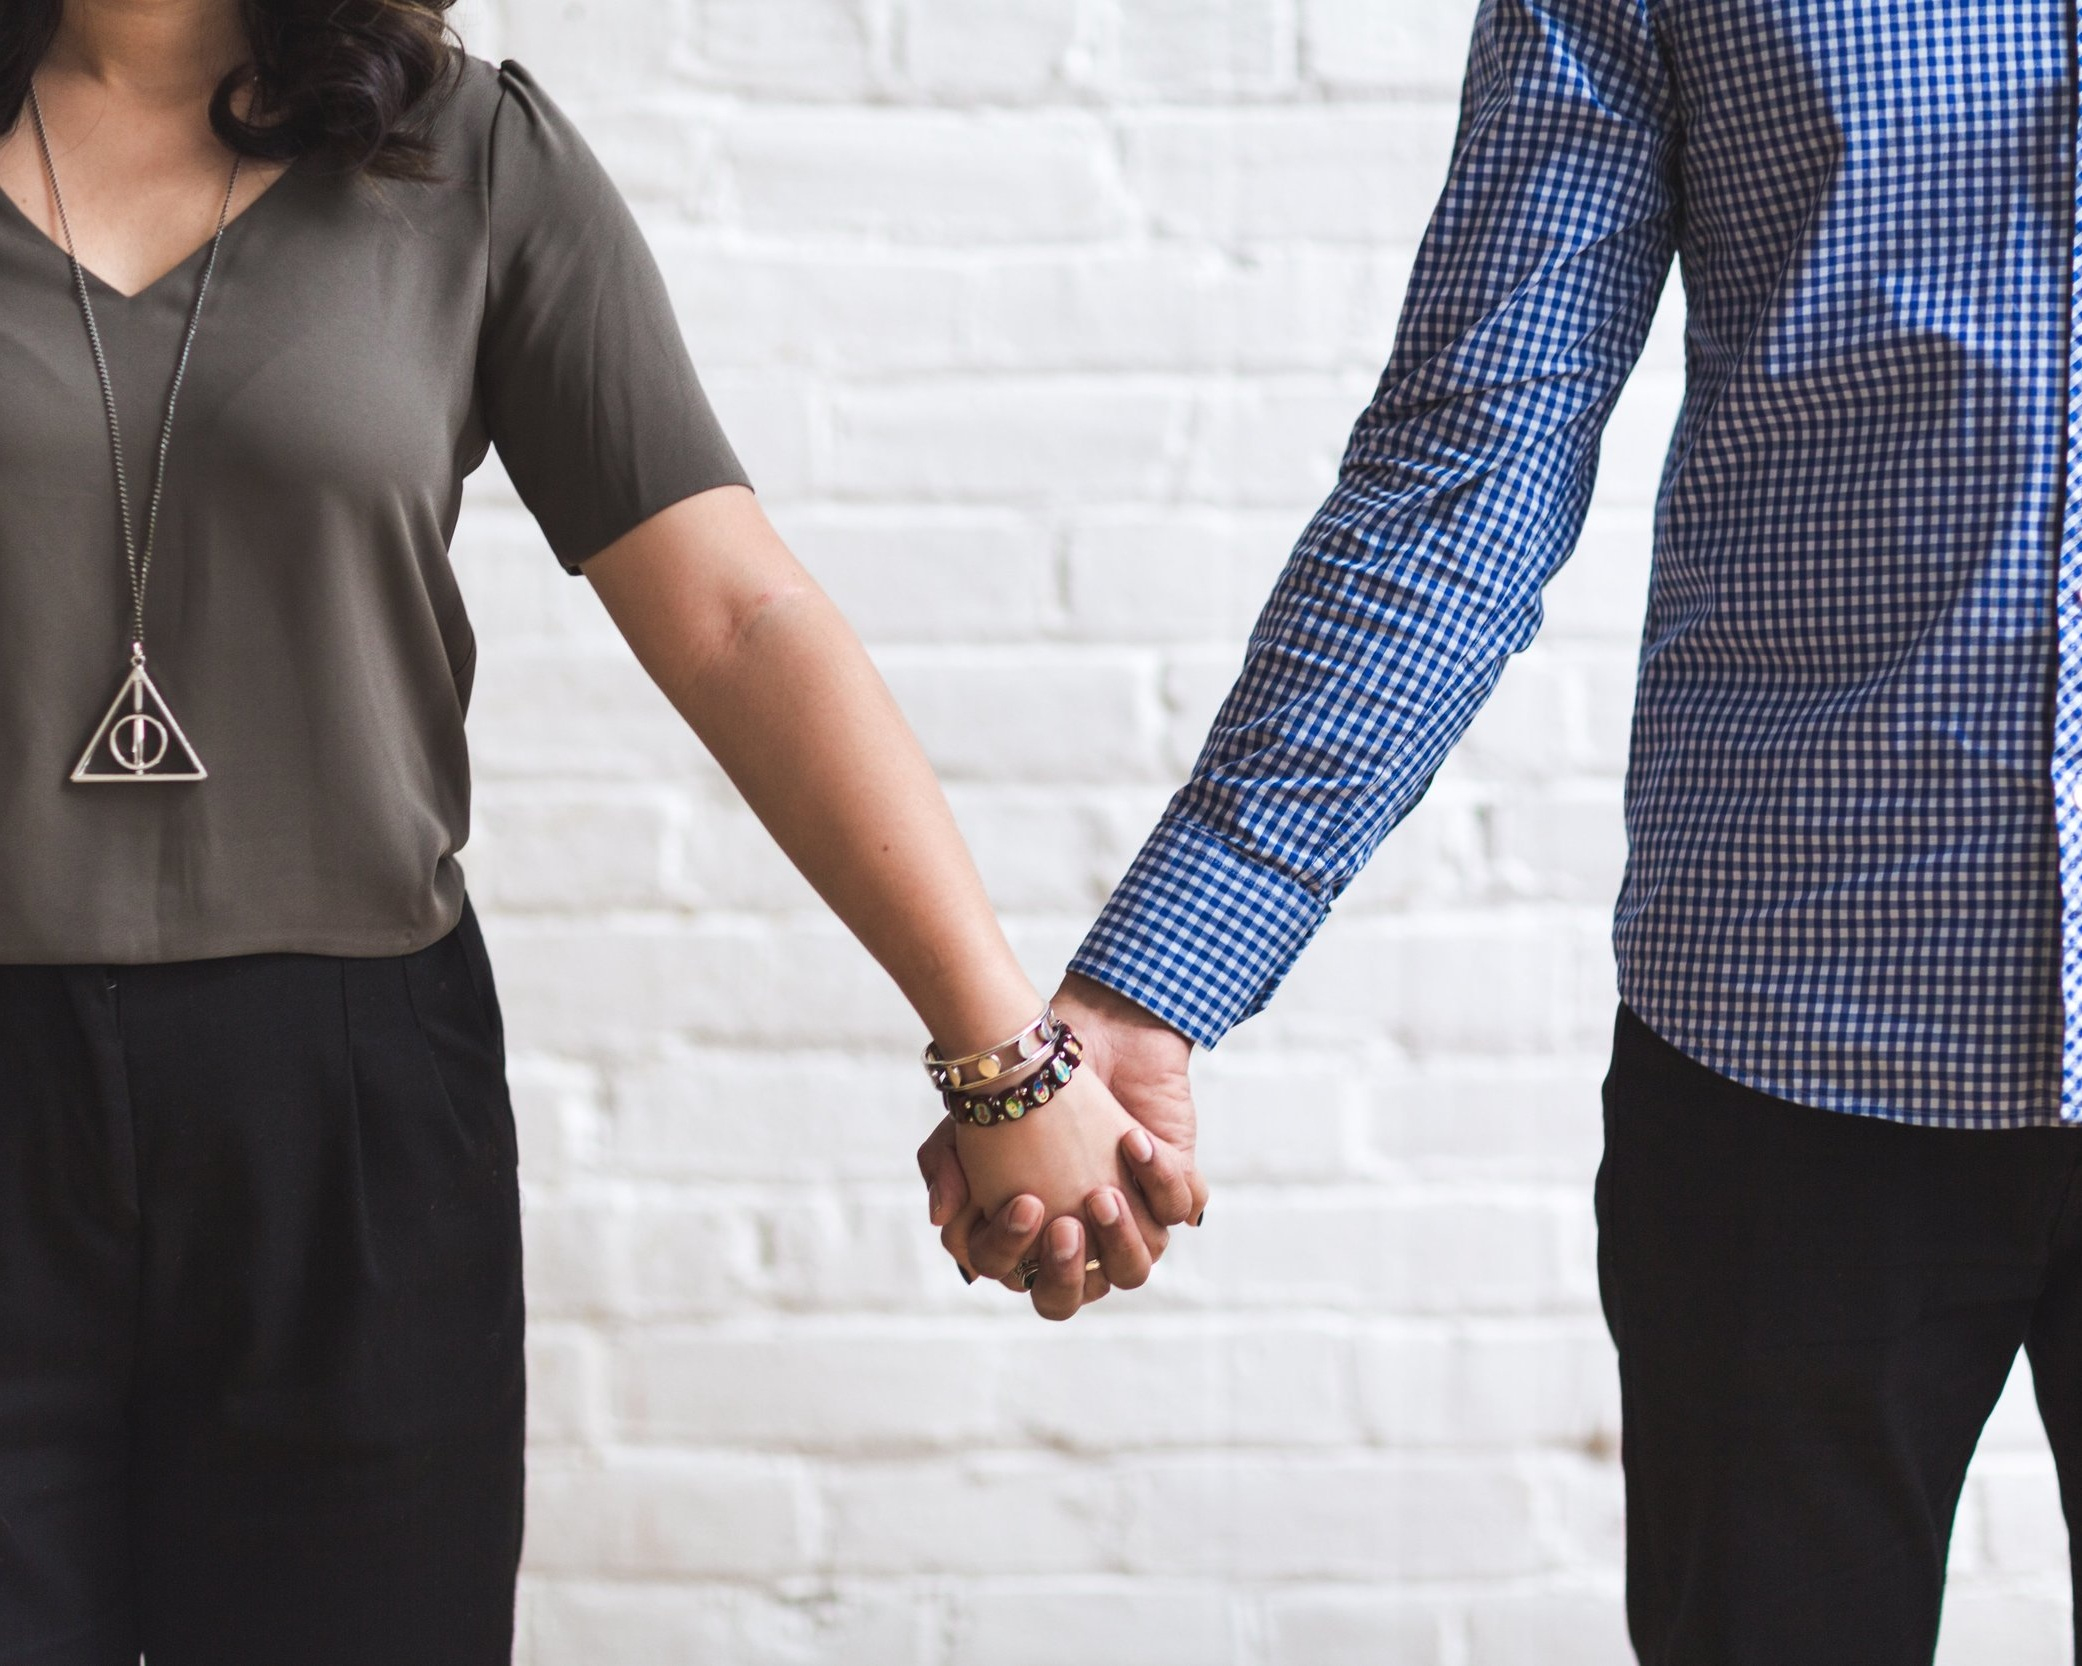 couple-holding-hands_4460x4460+%281%29.jpg